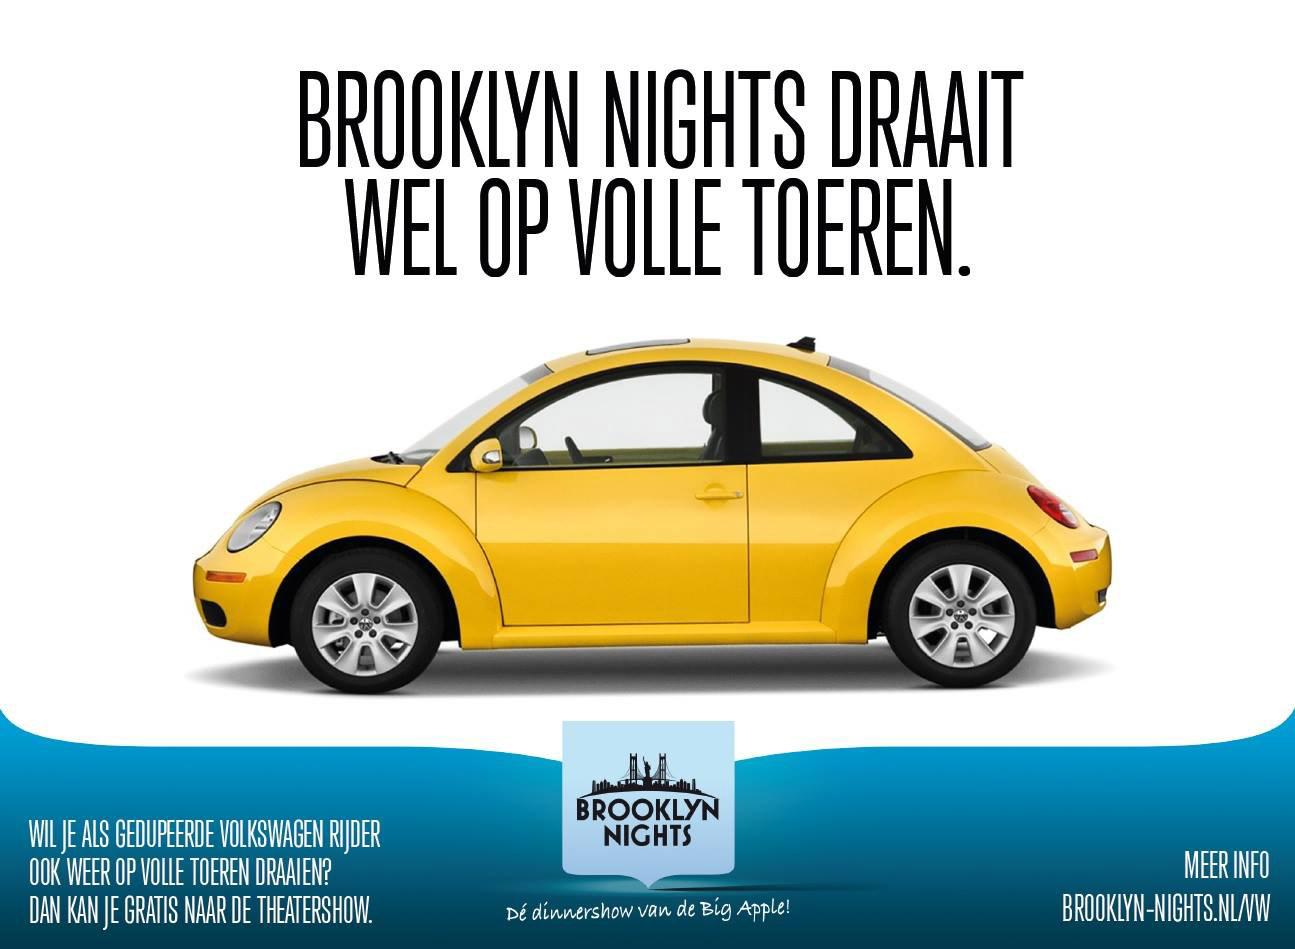 brooklyn_nights_vw_actie_2